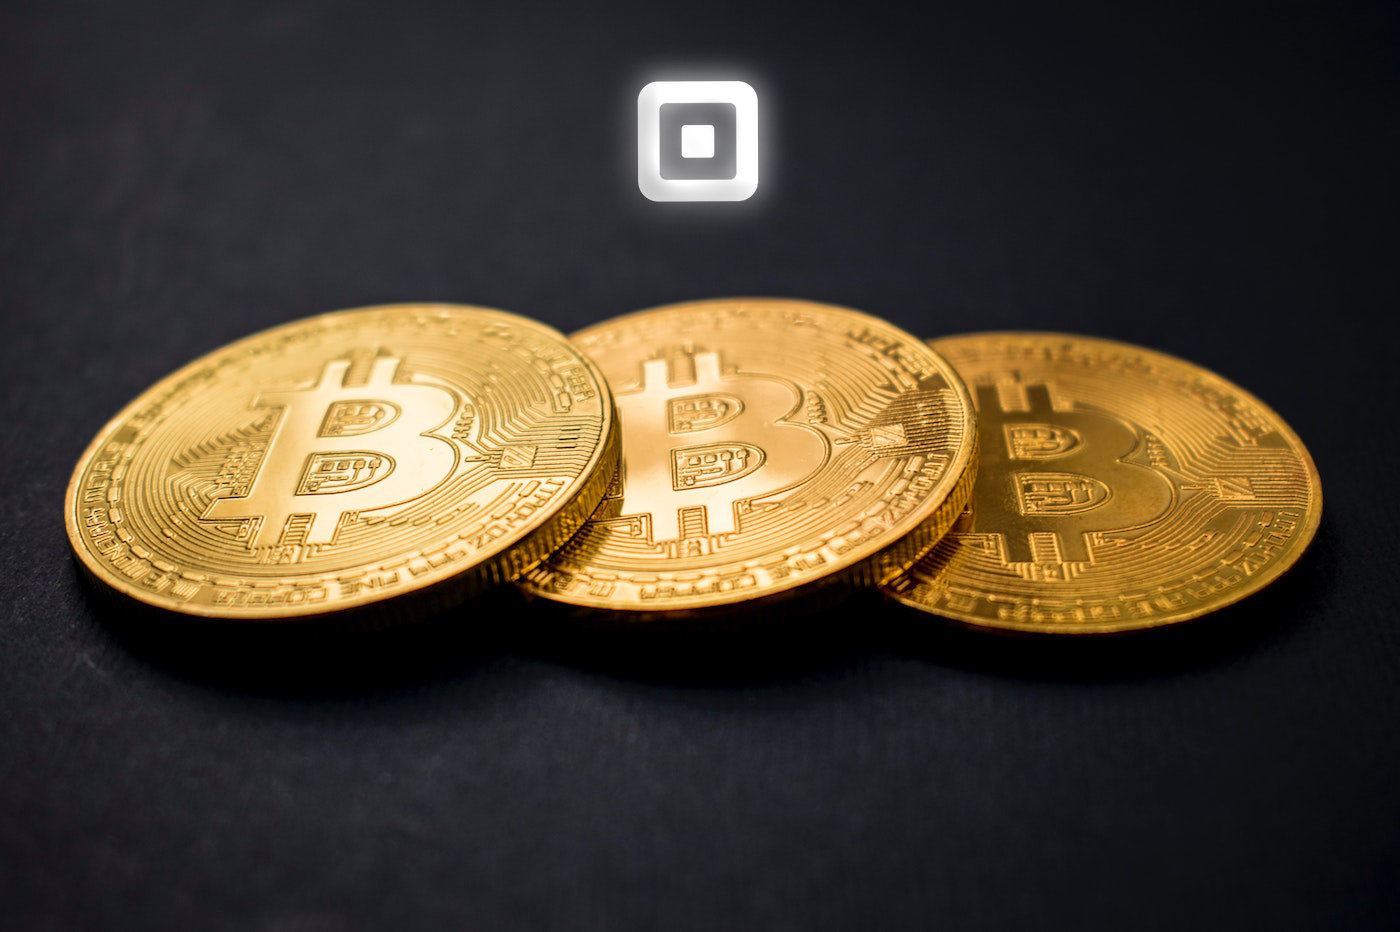 Stockage bitcoins che tao sung tu buy bitcoins